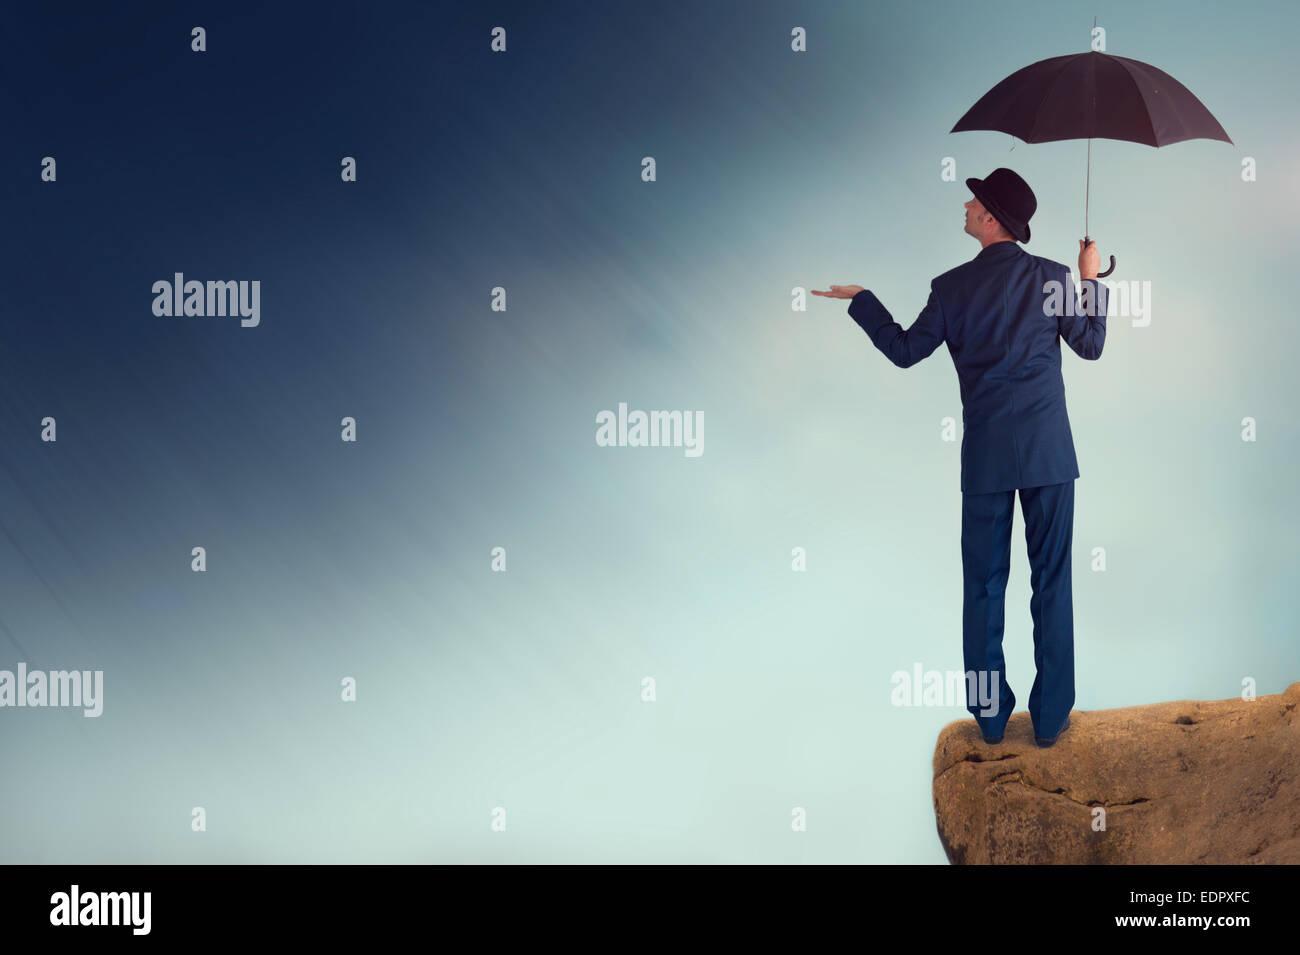 economic forecast outlook concept - Stock Image